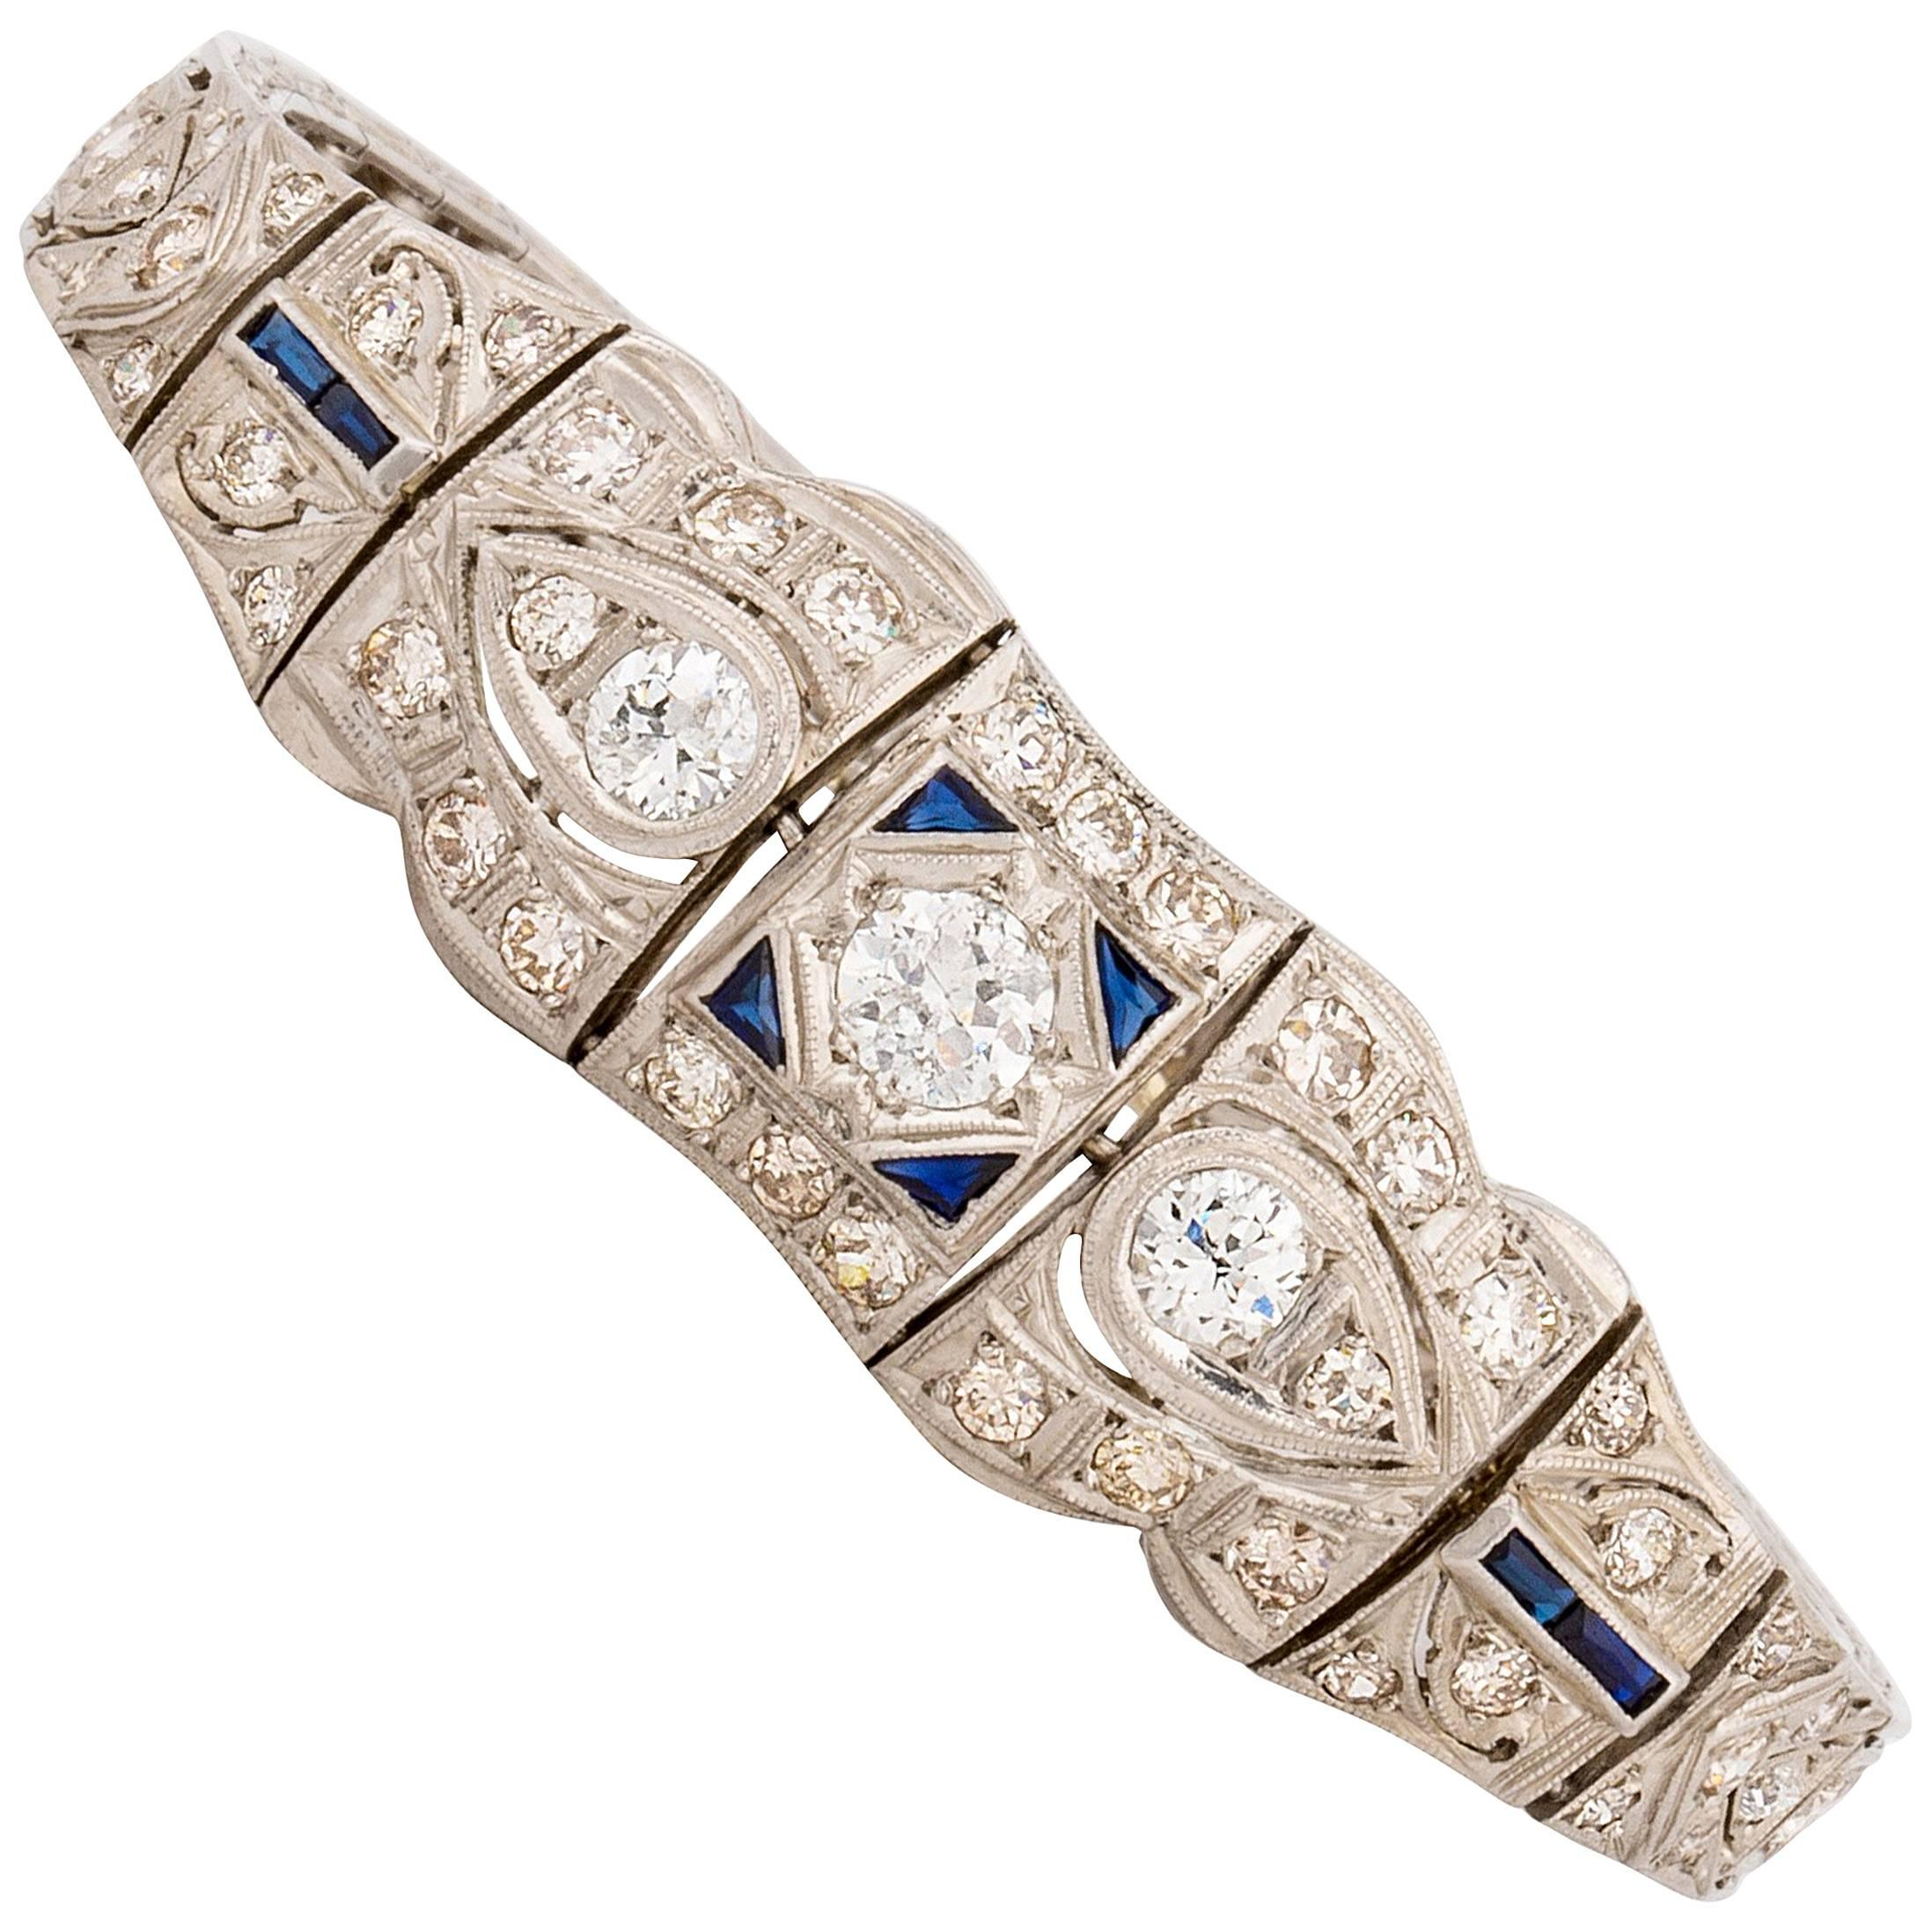 Art Deco Openwork Diamond Bracelet in Platinum